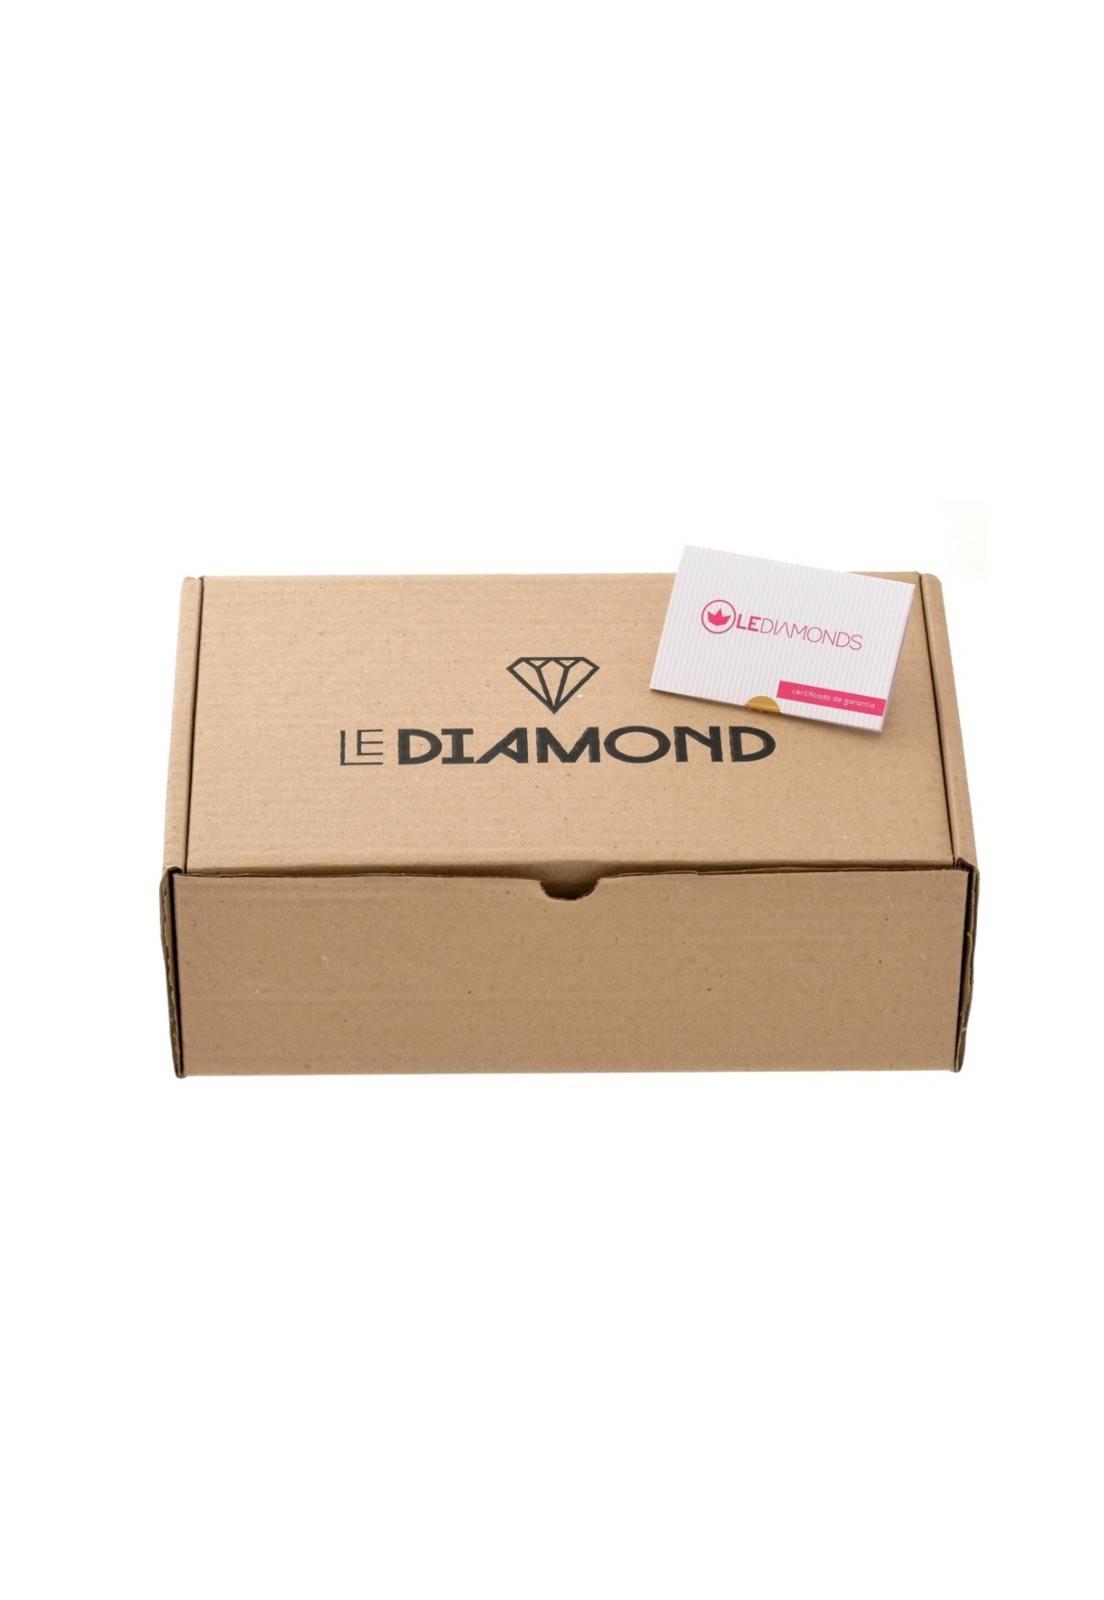 Colar Le Diamond Olimpia com Elefante Preto